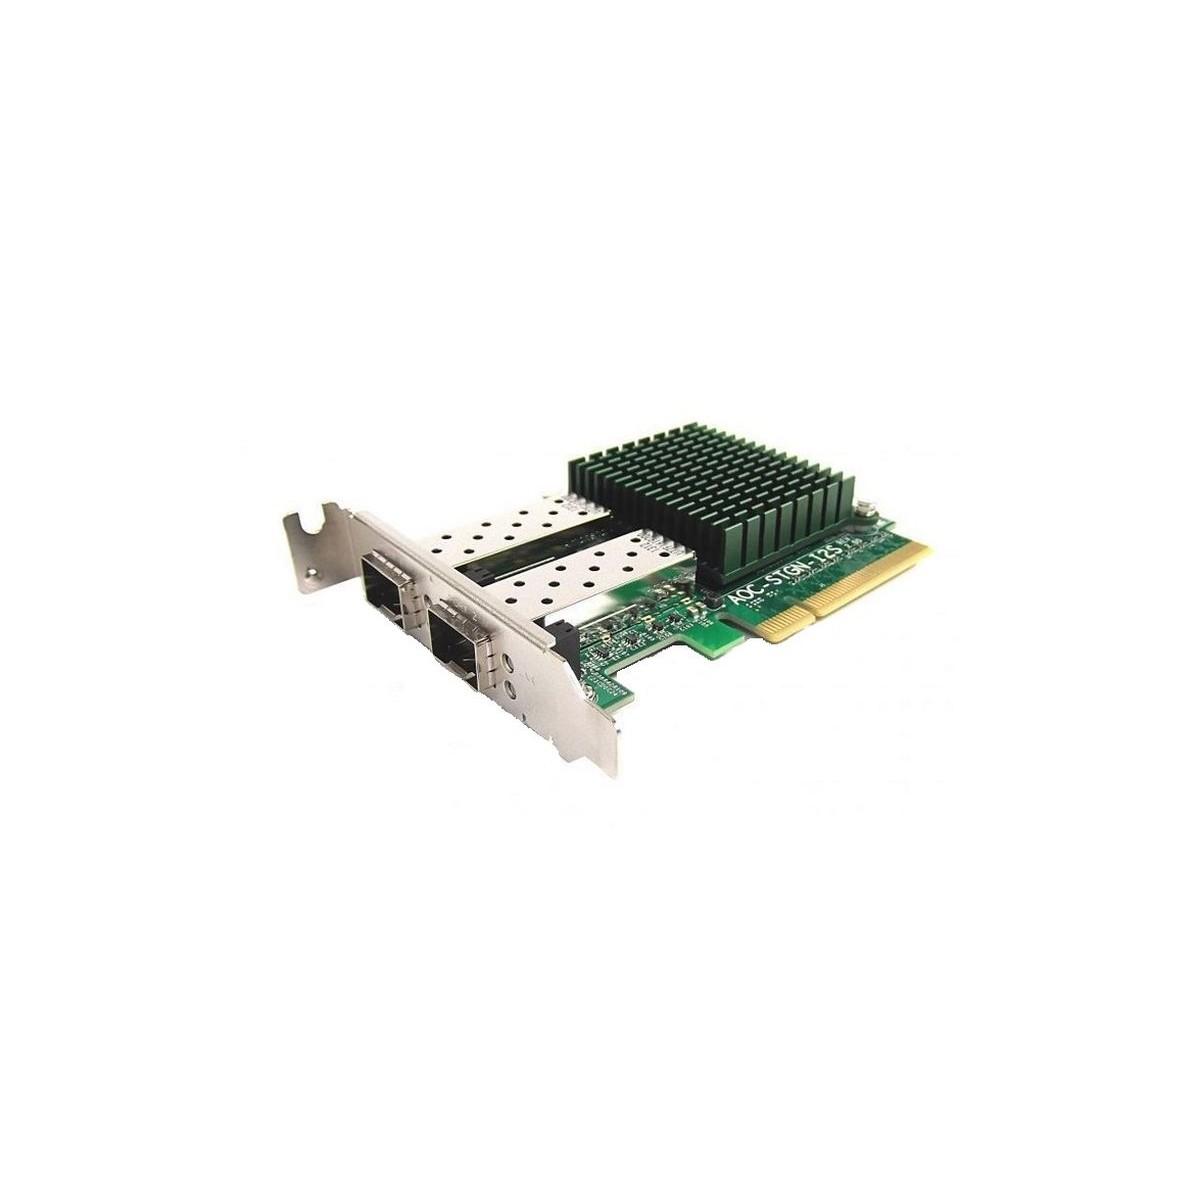 PAMIEC SAMSUNG 2GB 2Rx8 PC2-6400E M378T5663QZ3-CF7